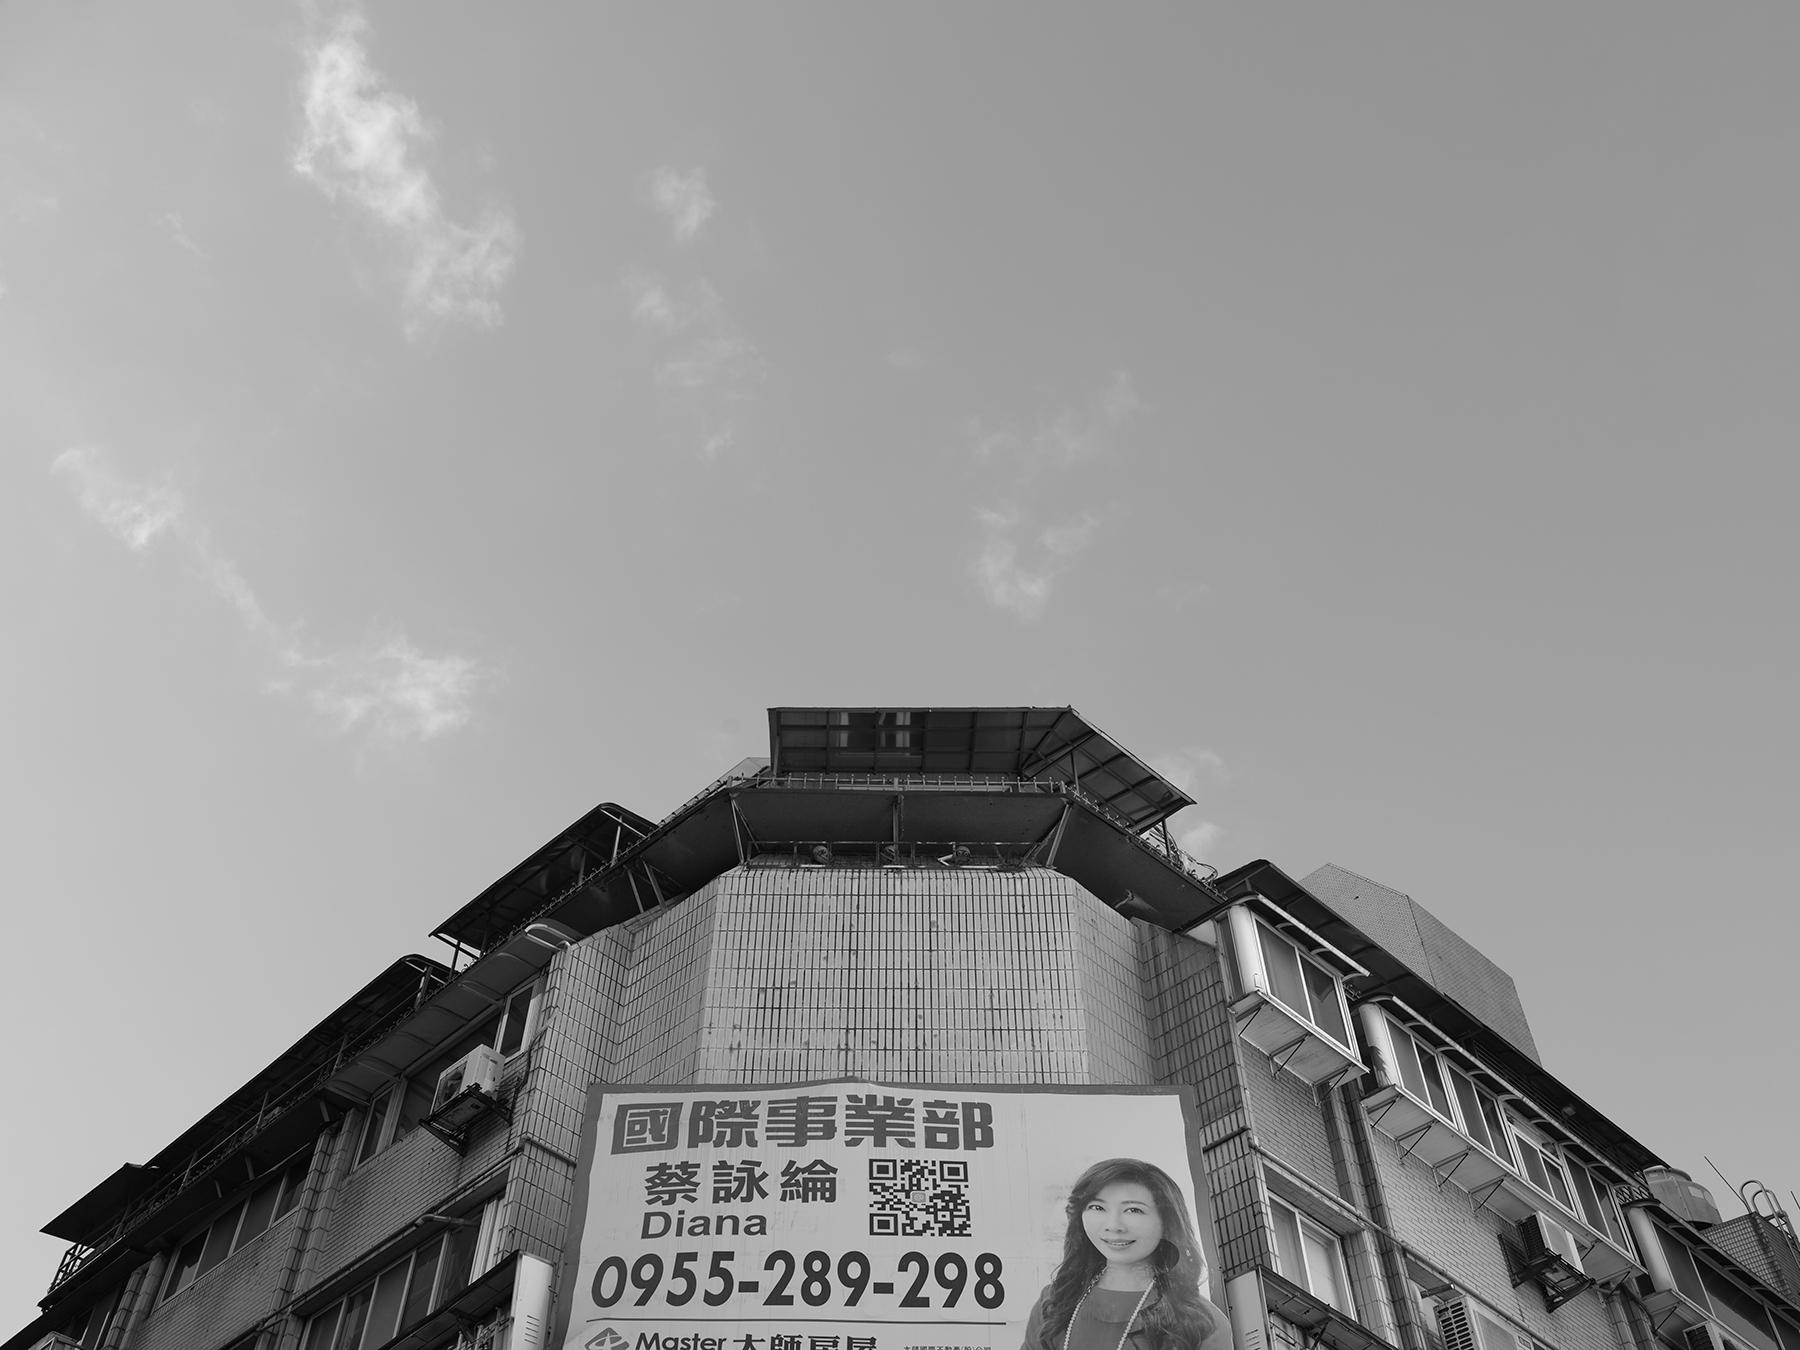 Residential, Daan District, Taipei, Taiwan